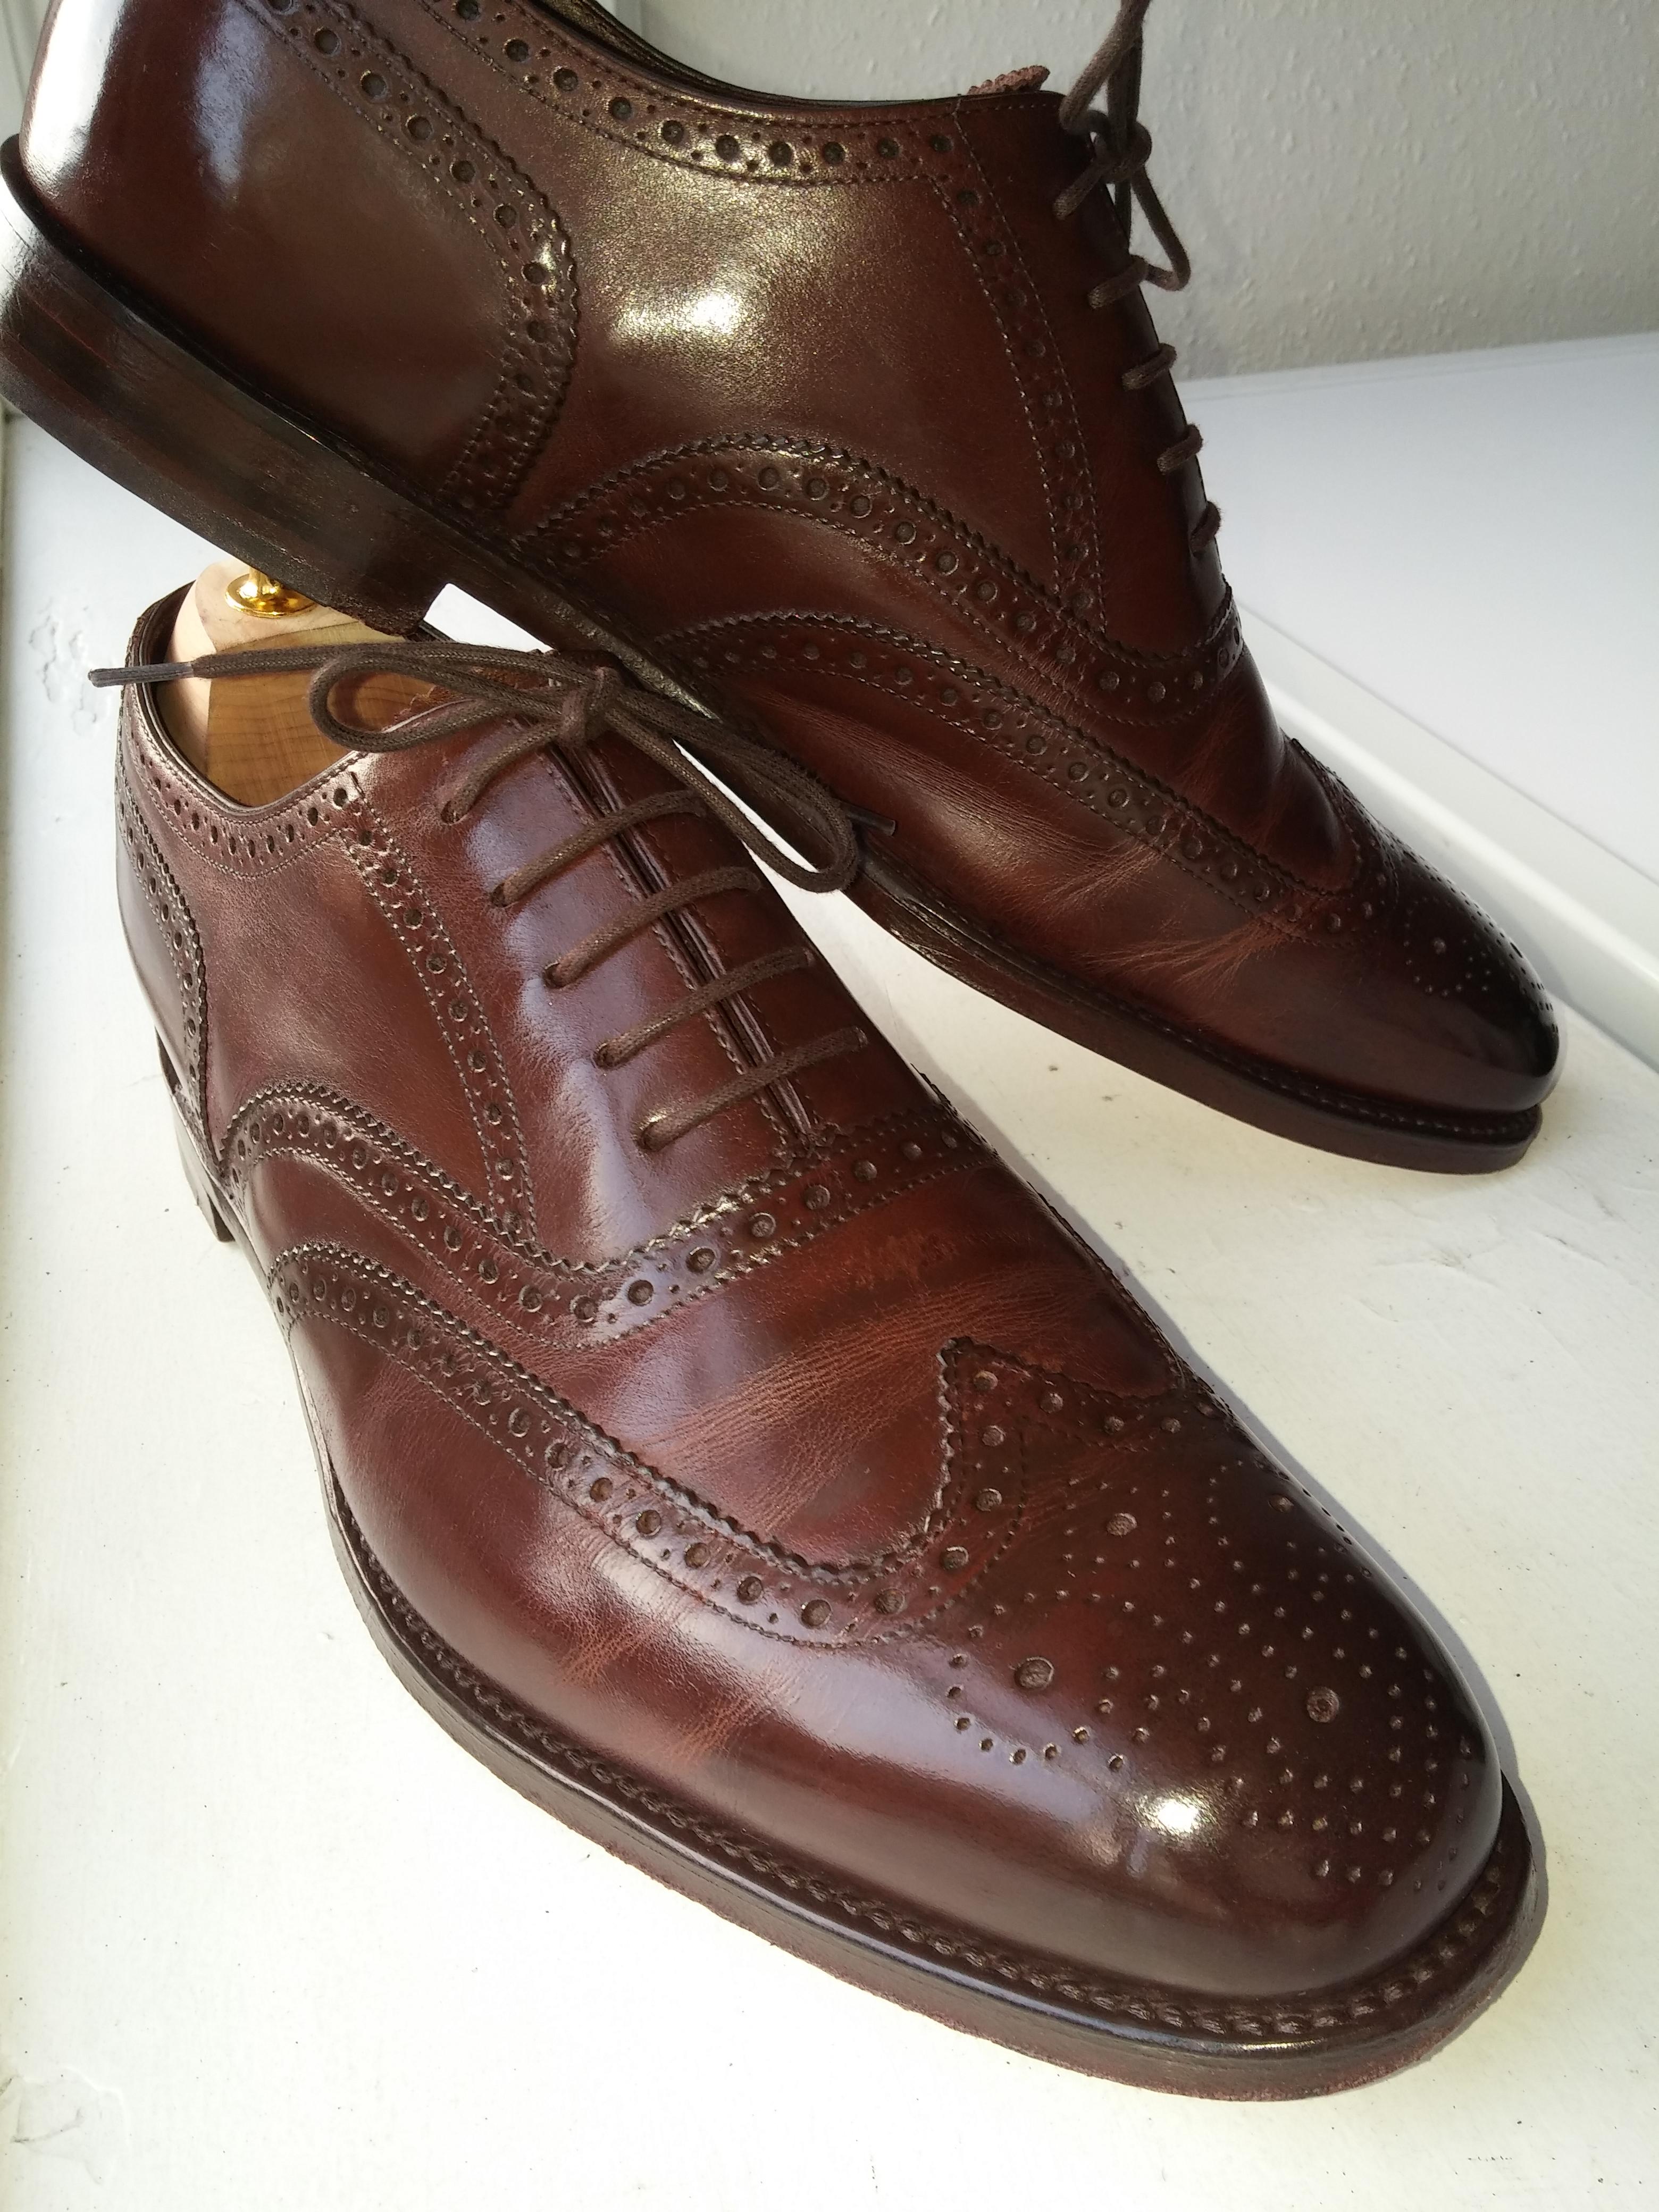 Loake 1880 Buckingham Dark brown. Polished with burgandy saphir shoe polish for almost a year.